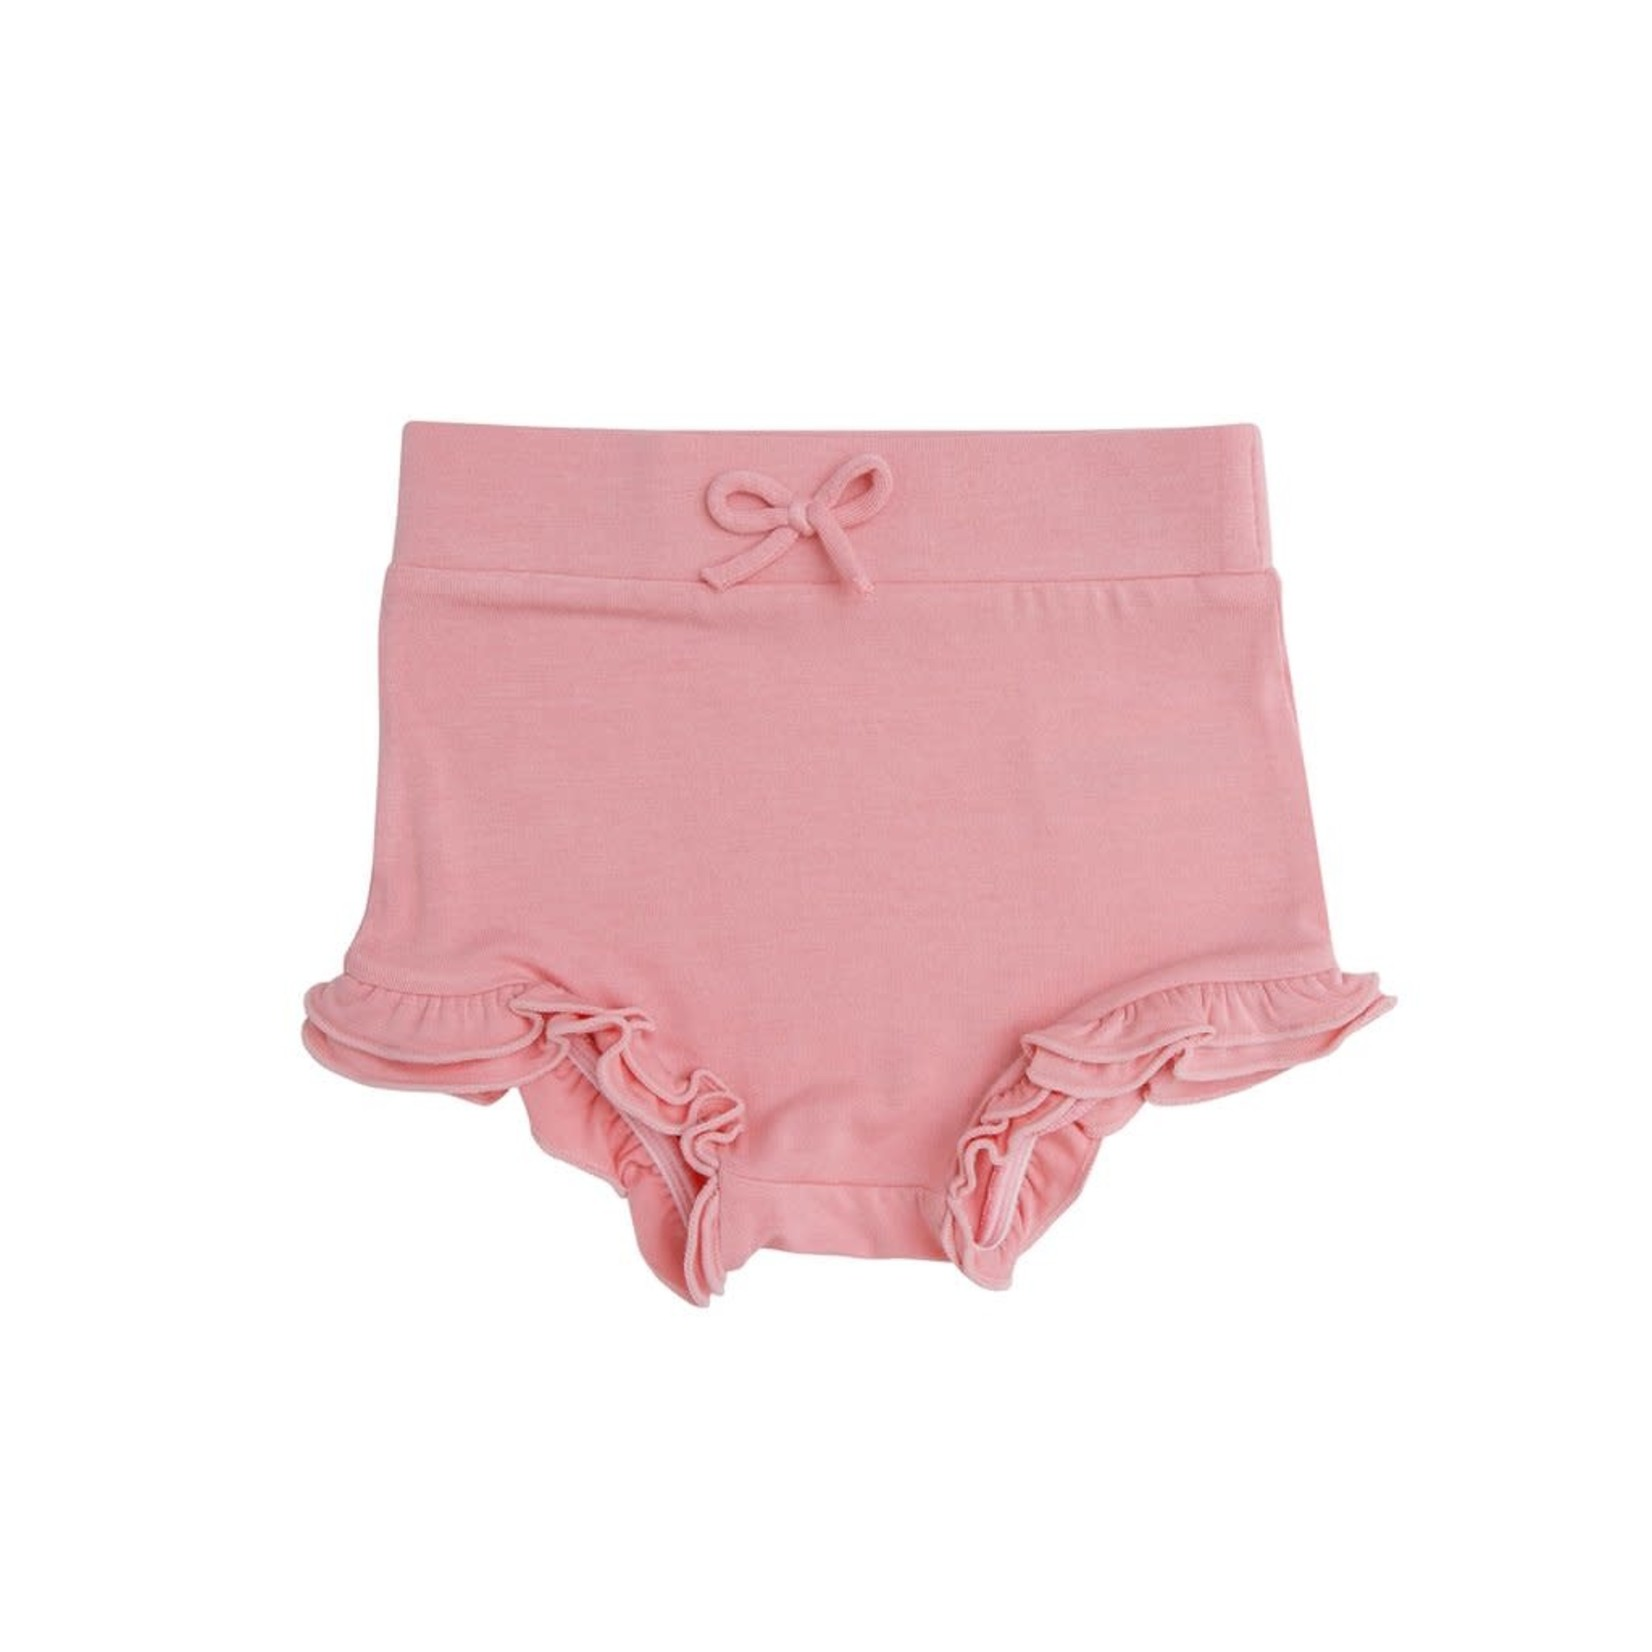 Angel Dear Modern Basics High Waist Shorts Blossom